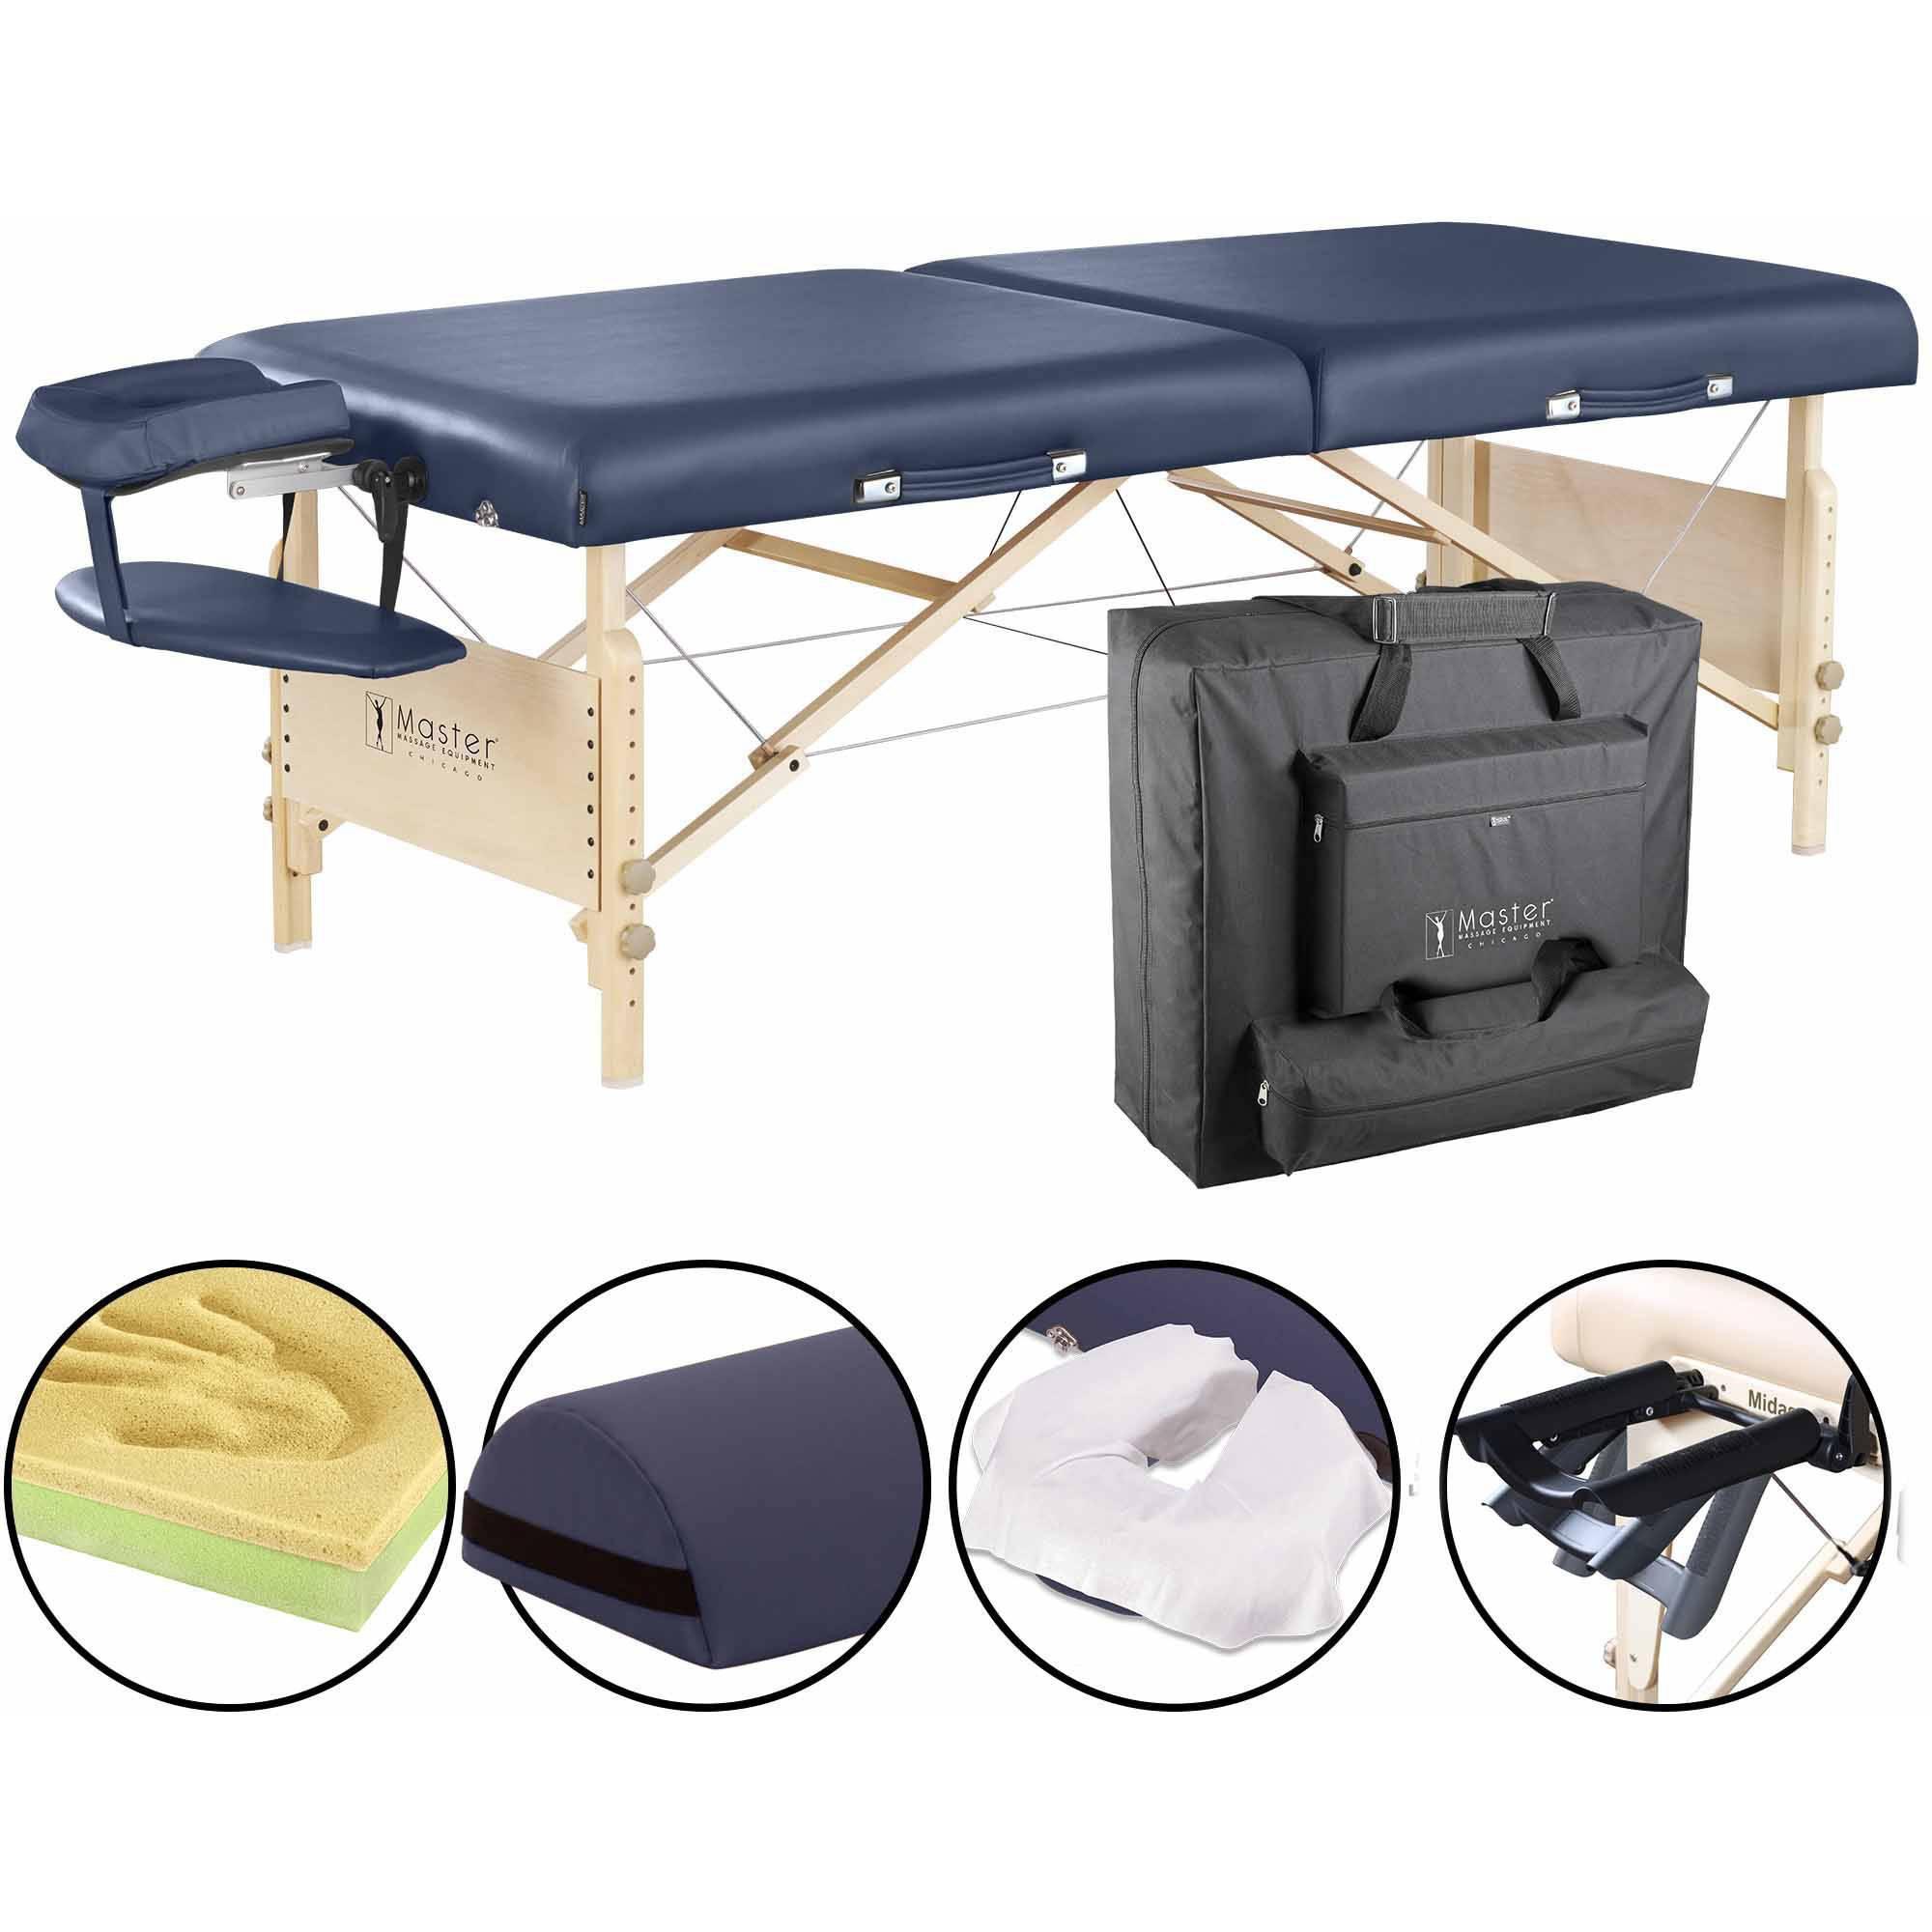 "Master Massage 30"" Coronado LX Massage Table Package, Blue"